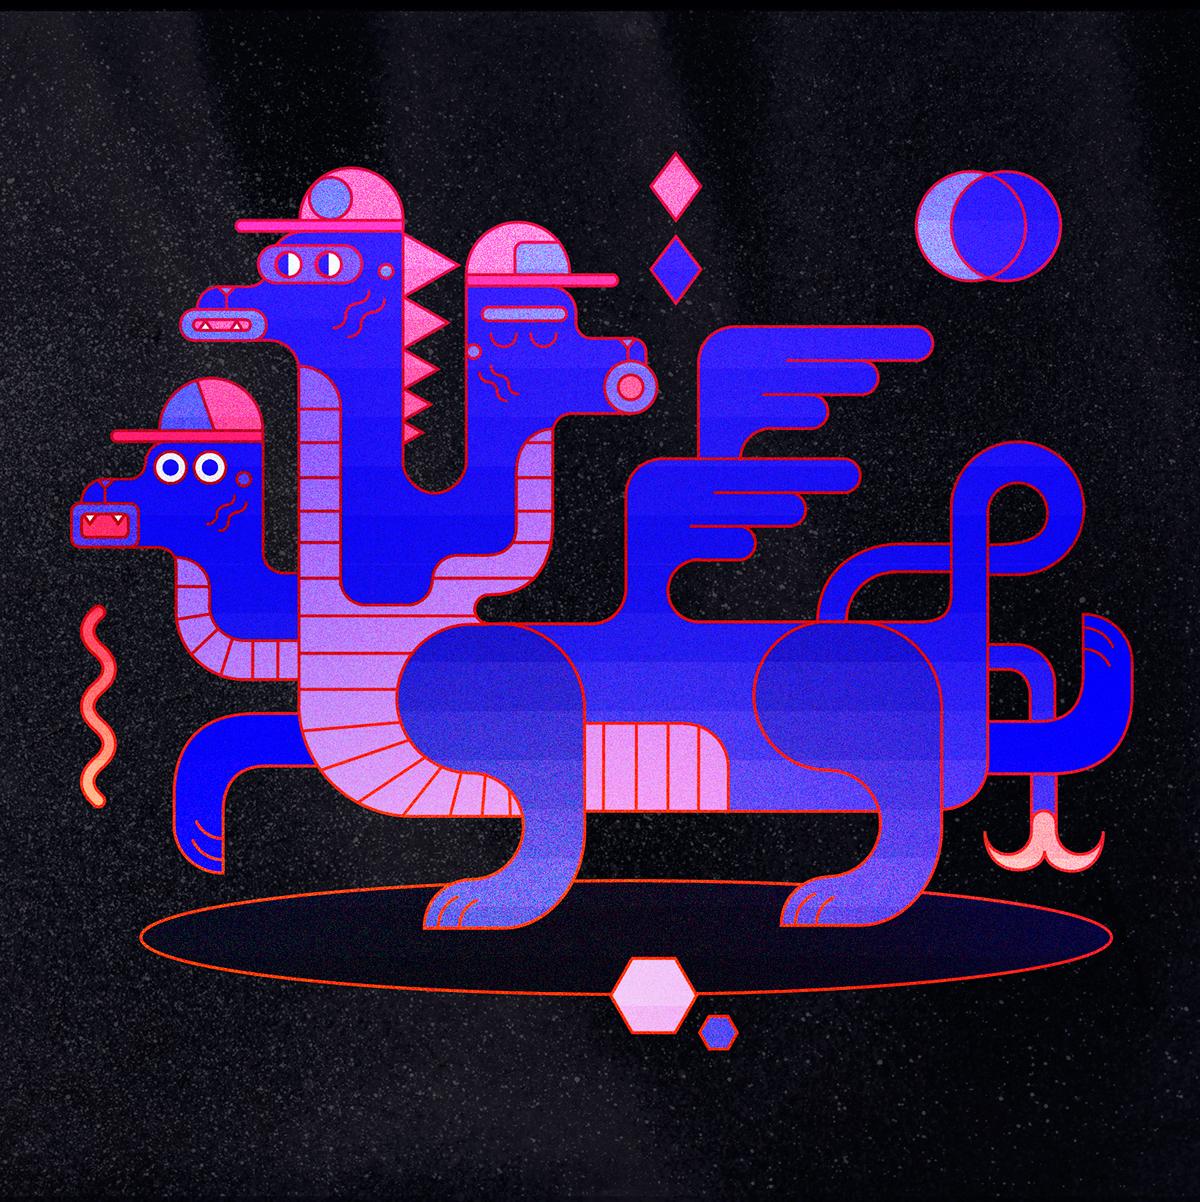 cerberus Griffin geometric geometry dog cap Wiggle 3 headed red blue